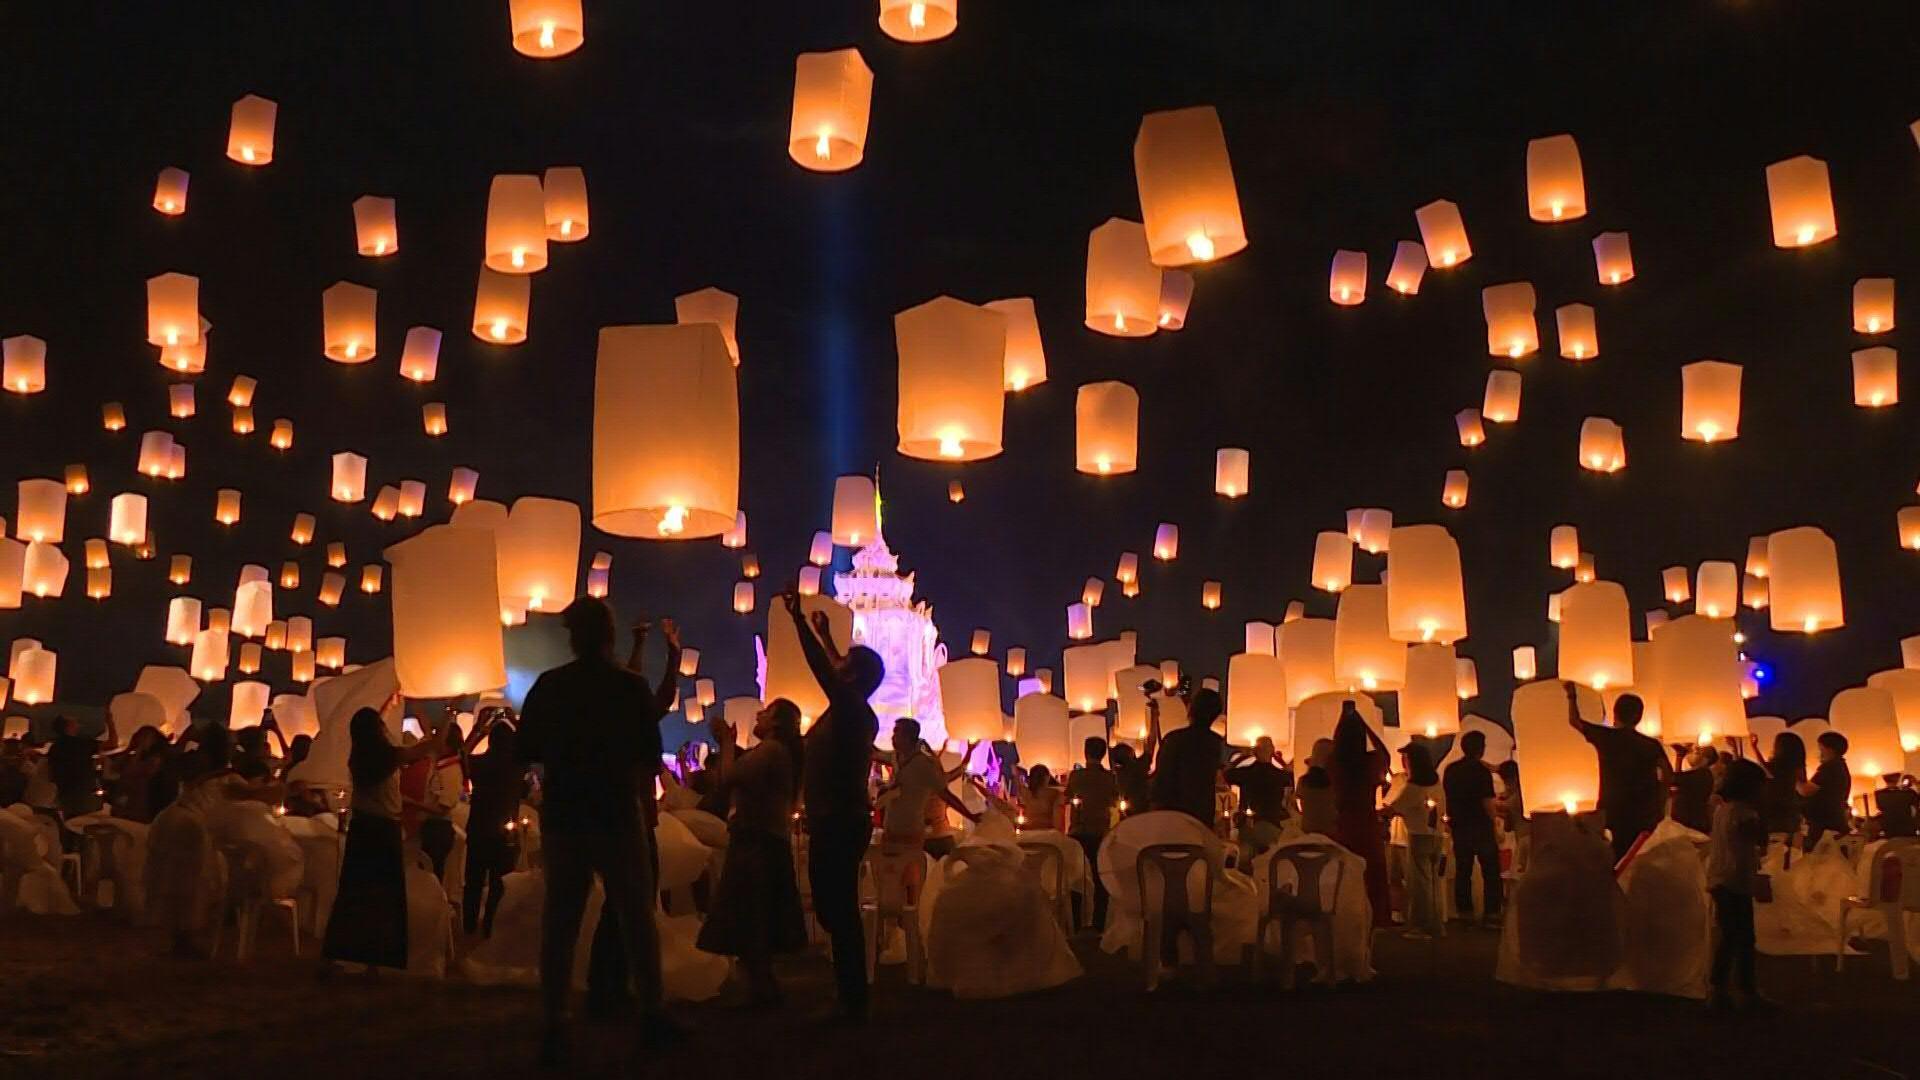 1 000 Lanterns Brighten The Sky For The Yi Peng Festival In Thailand Cgtn